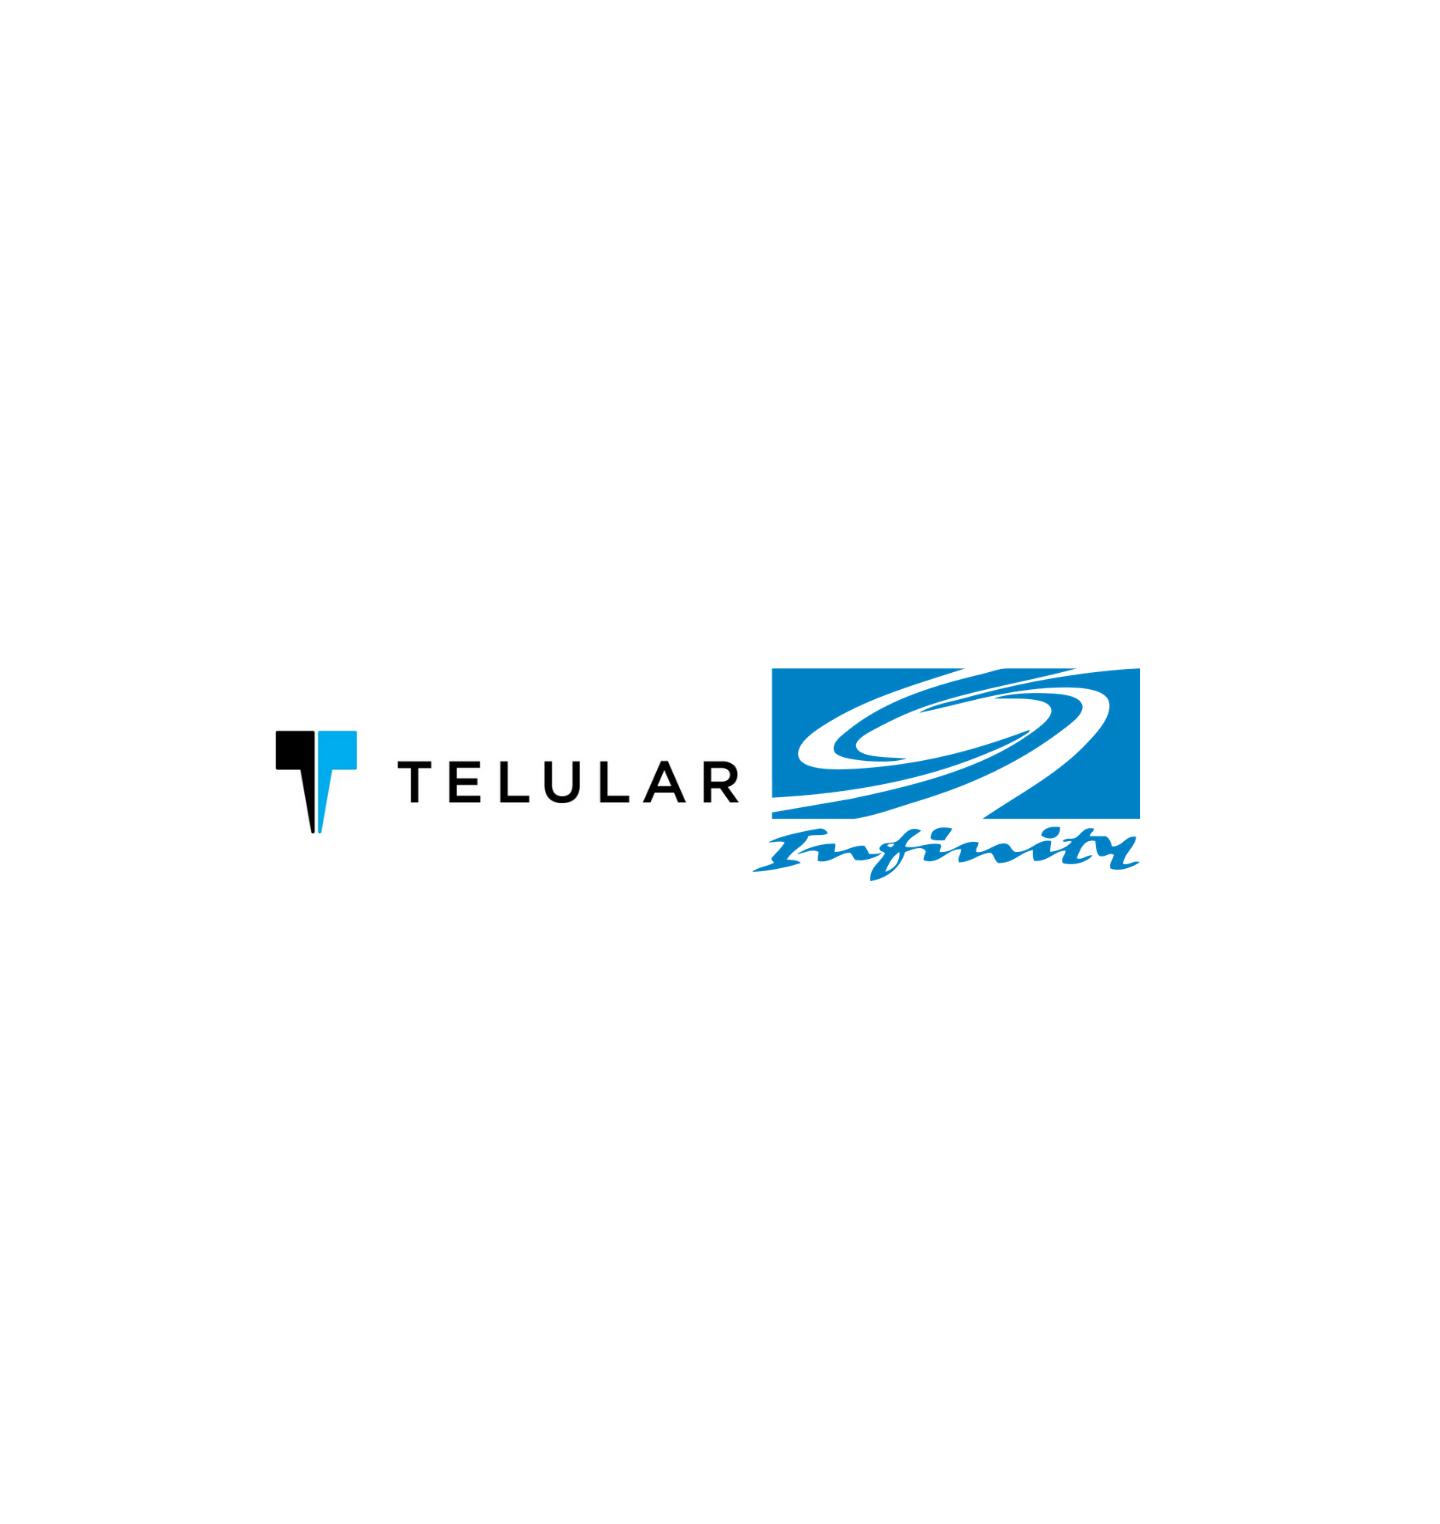 infinity-telular